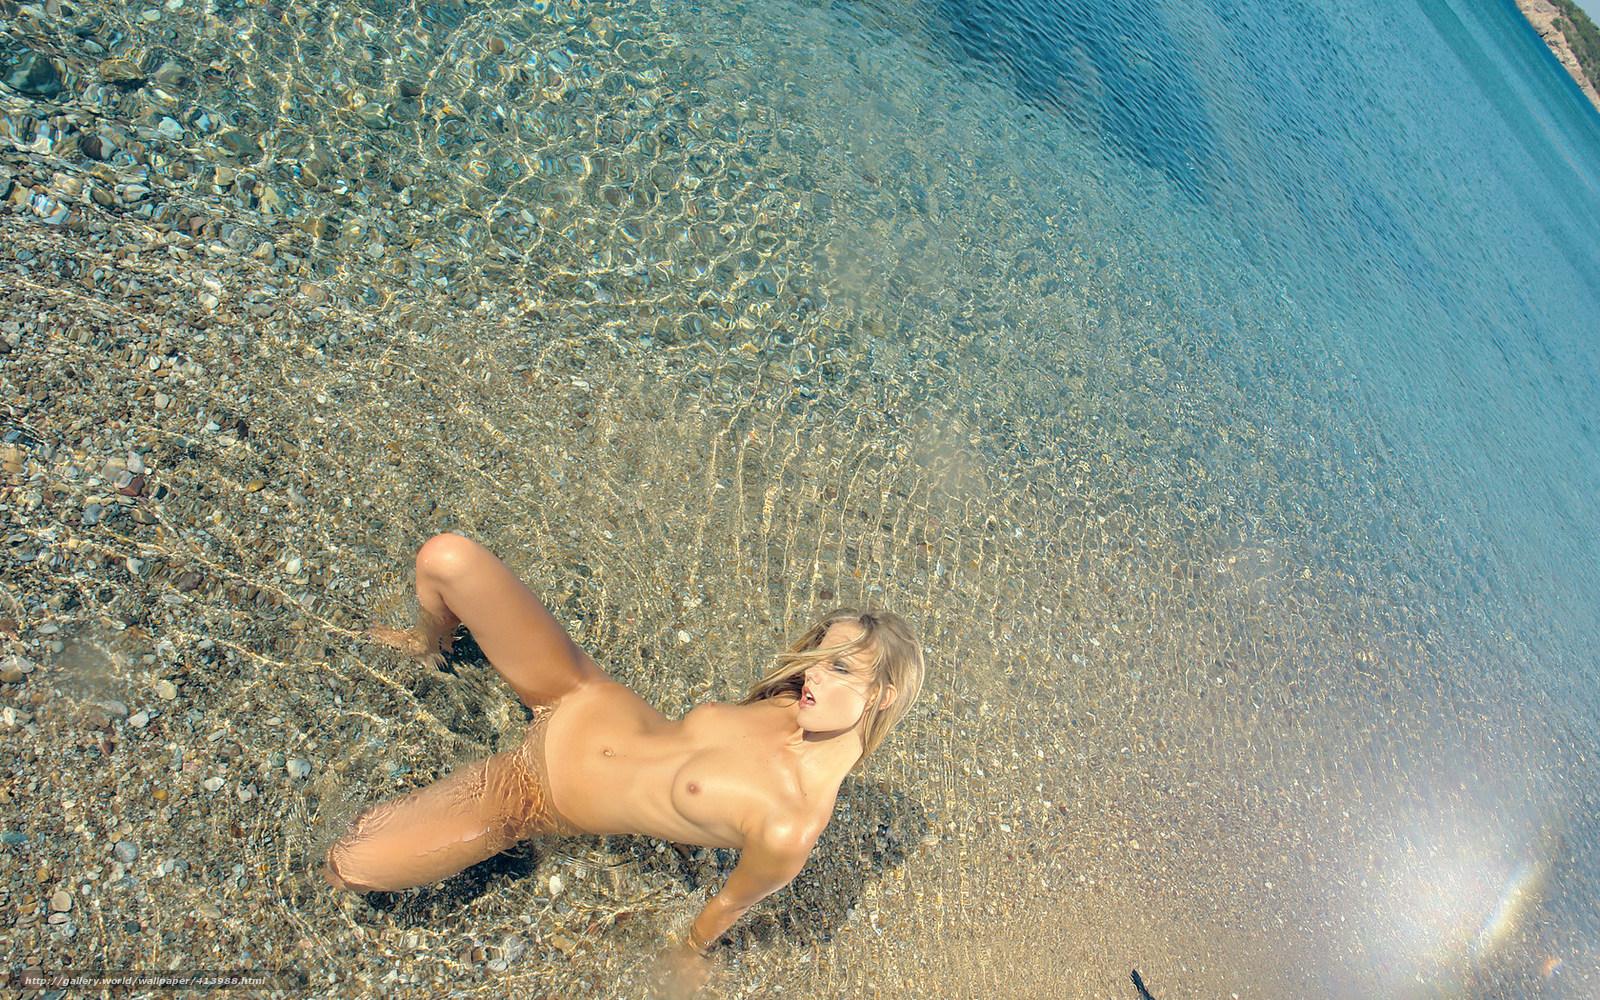 Секс на дне моря 6 фотография